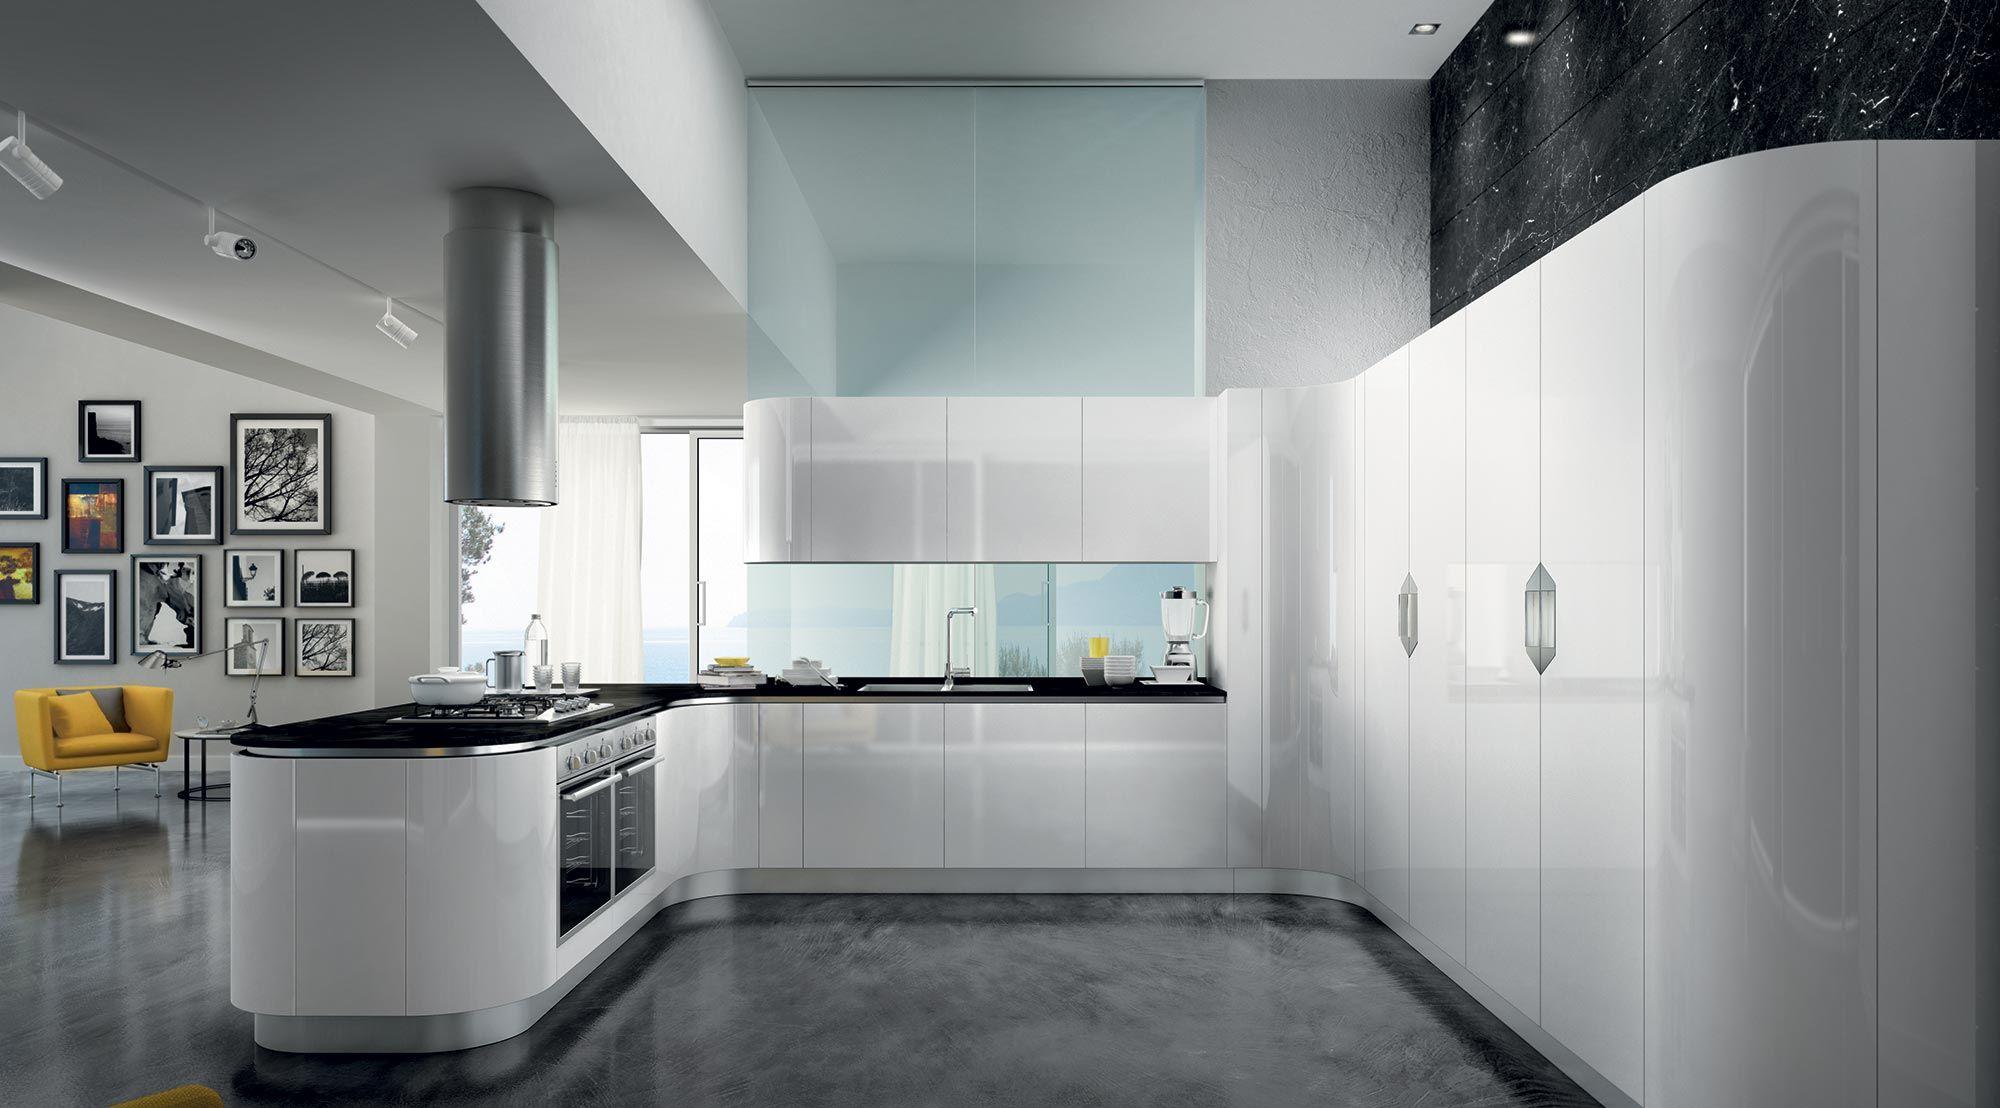 Cucina bianca. Total white kitchen. | M O D E R N K I T C H E N ...